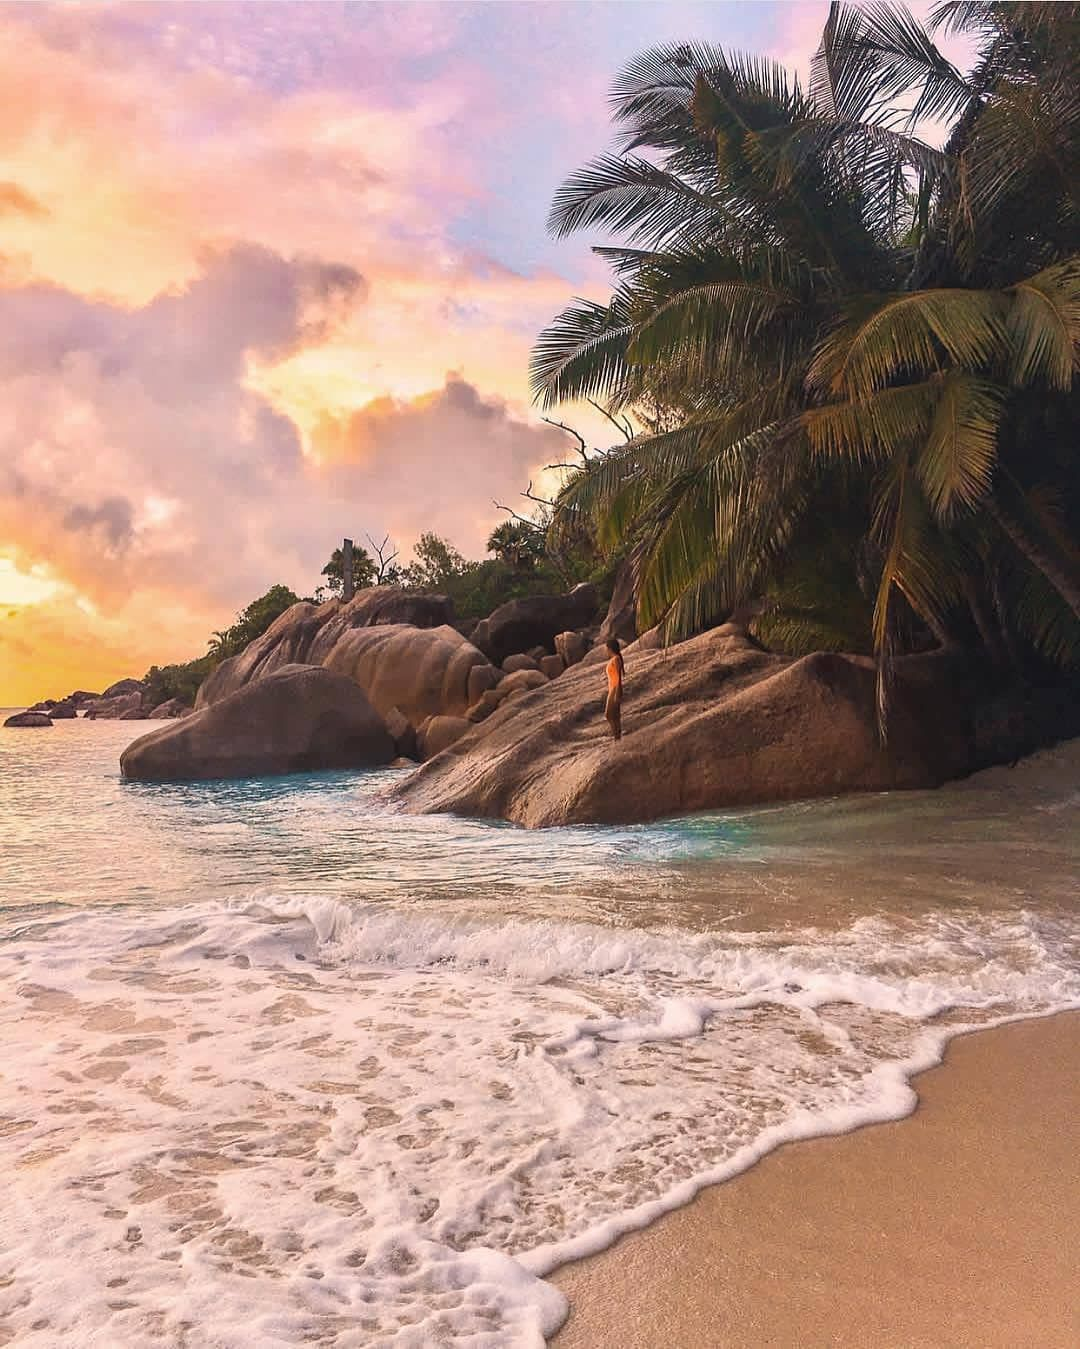 Seychelles Island Beaches: Praslin #Seychelles @ninjarod